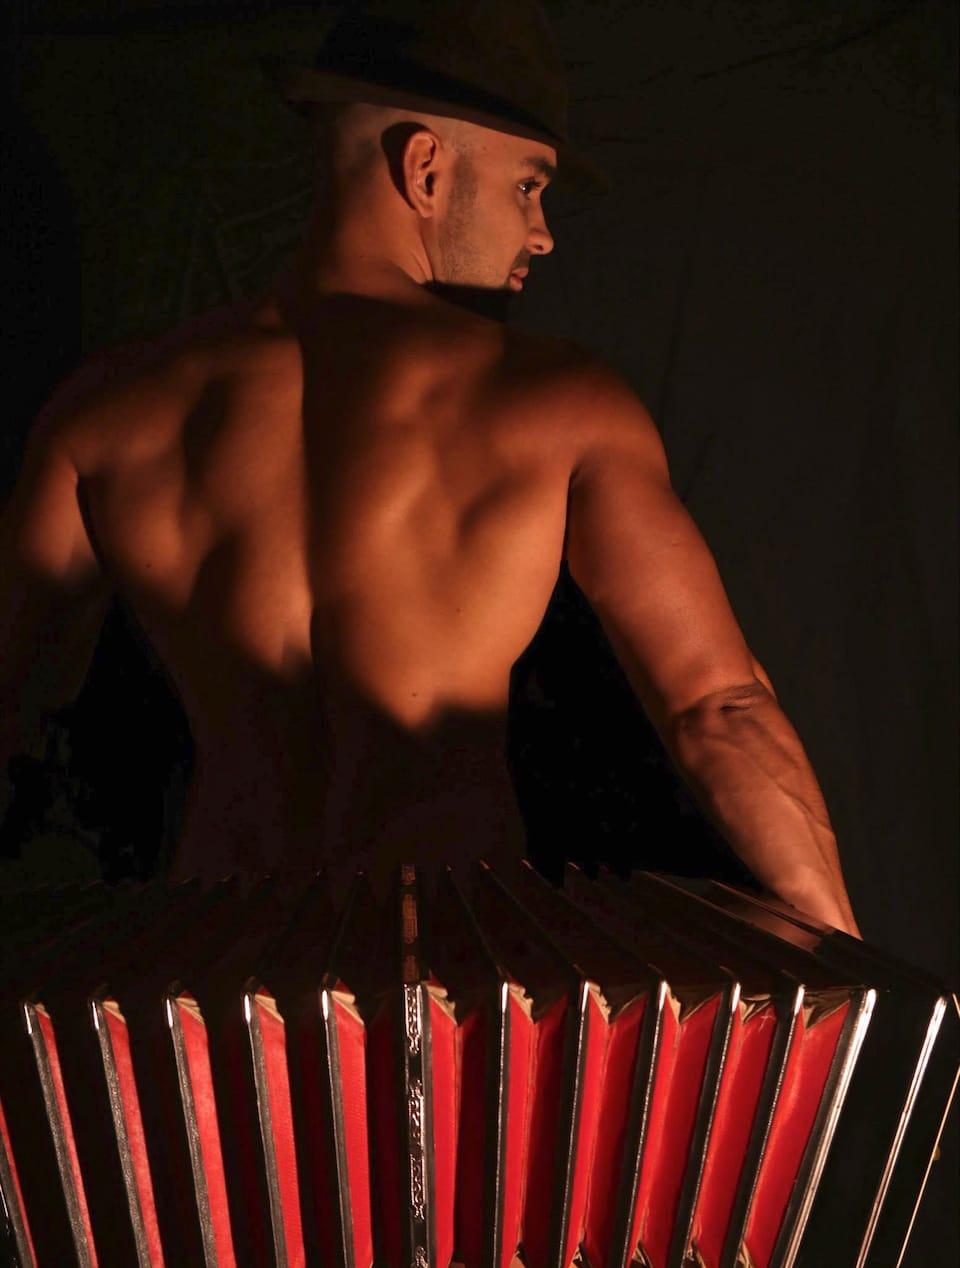 rodrigo dance teacher gay life in uruugay